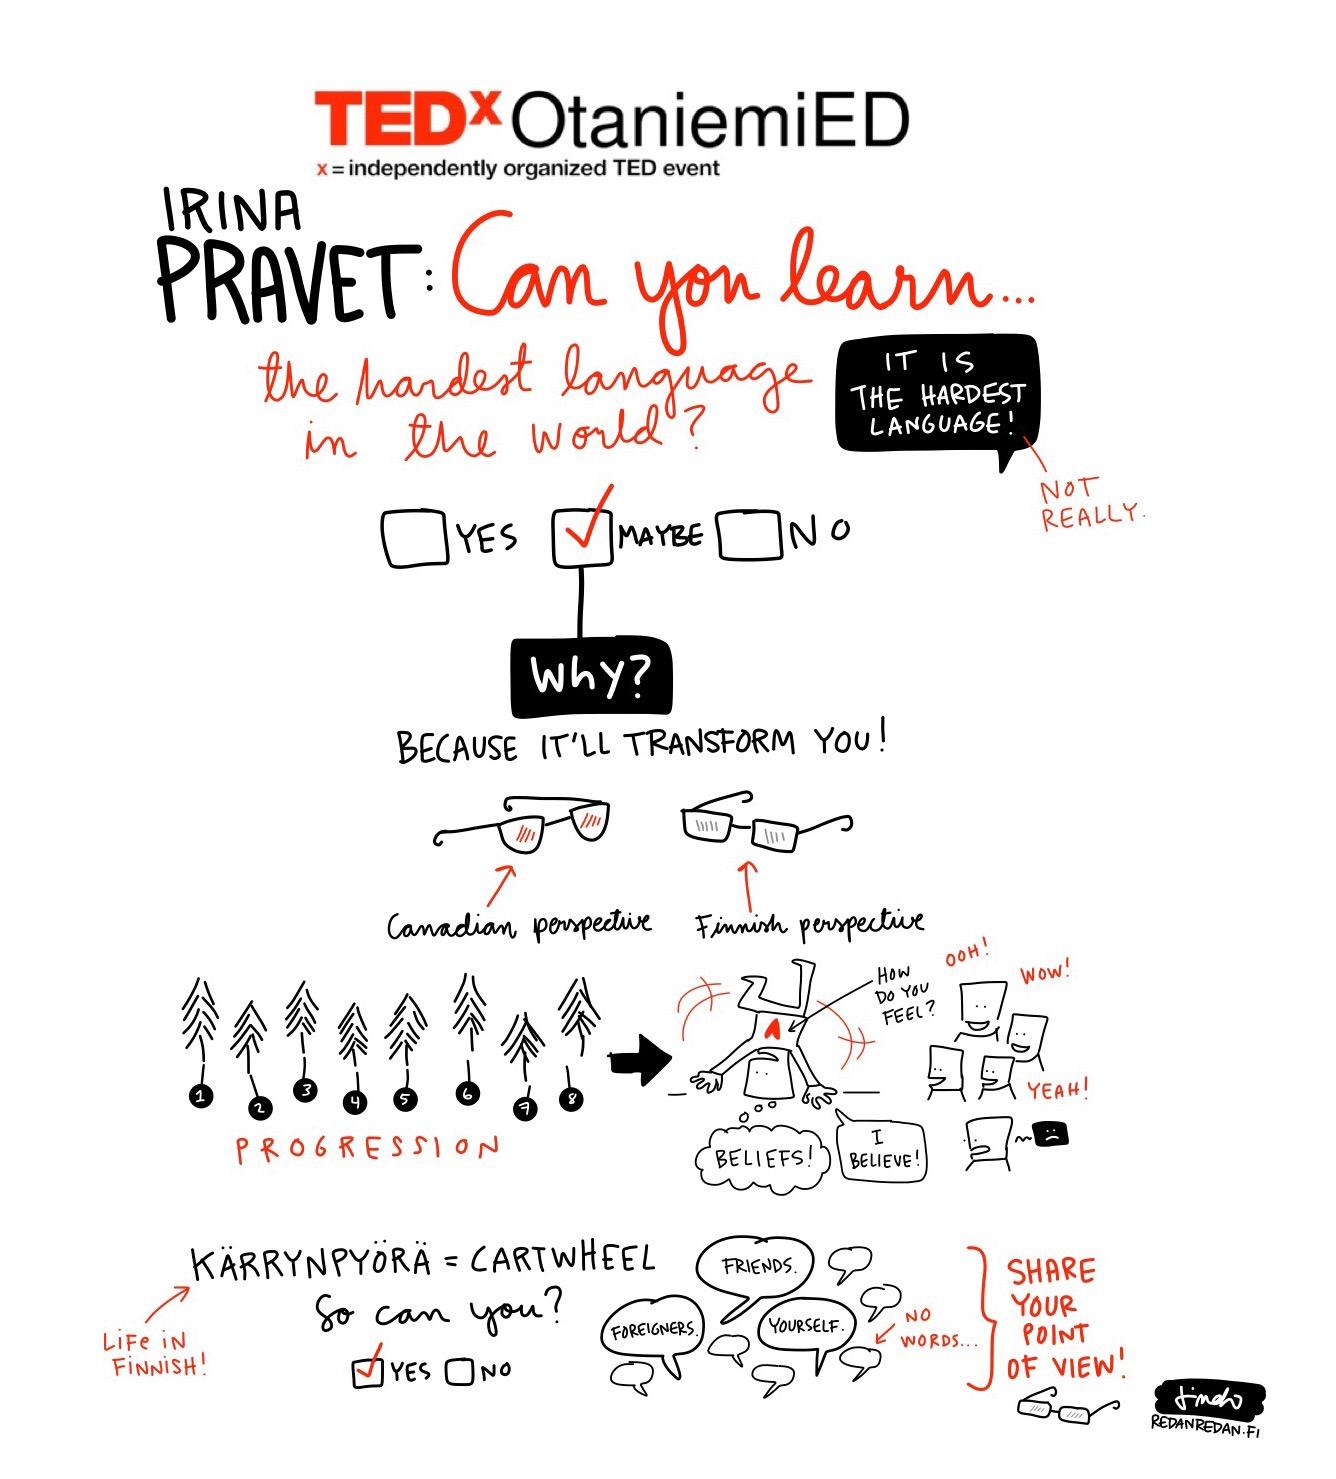 The talk is illustrated with Sketchnotes by Linda Saukko-Rauta at www.redanredan.fi.